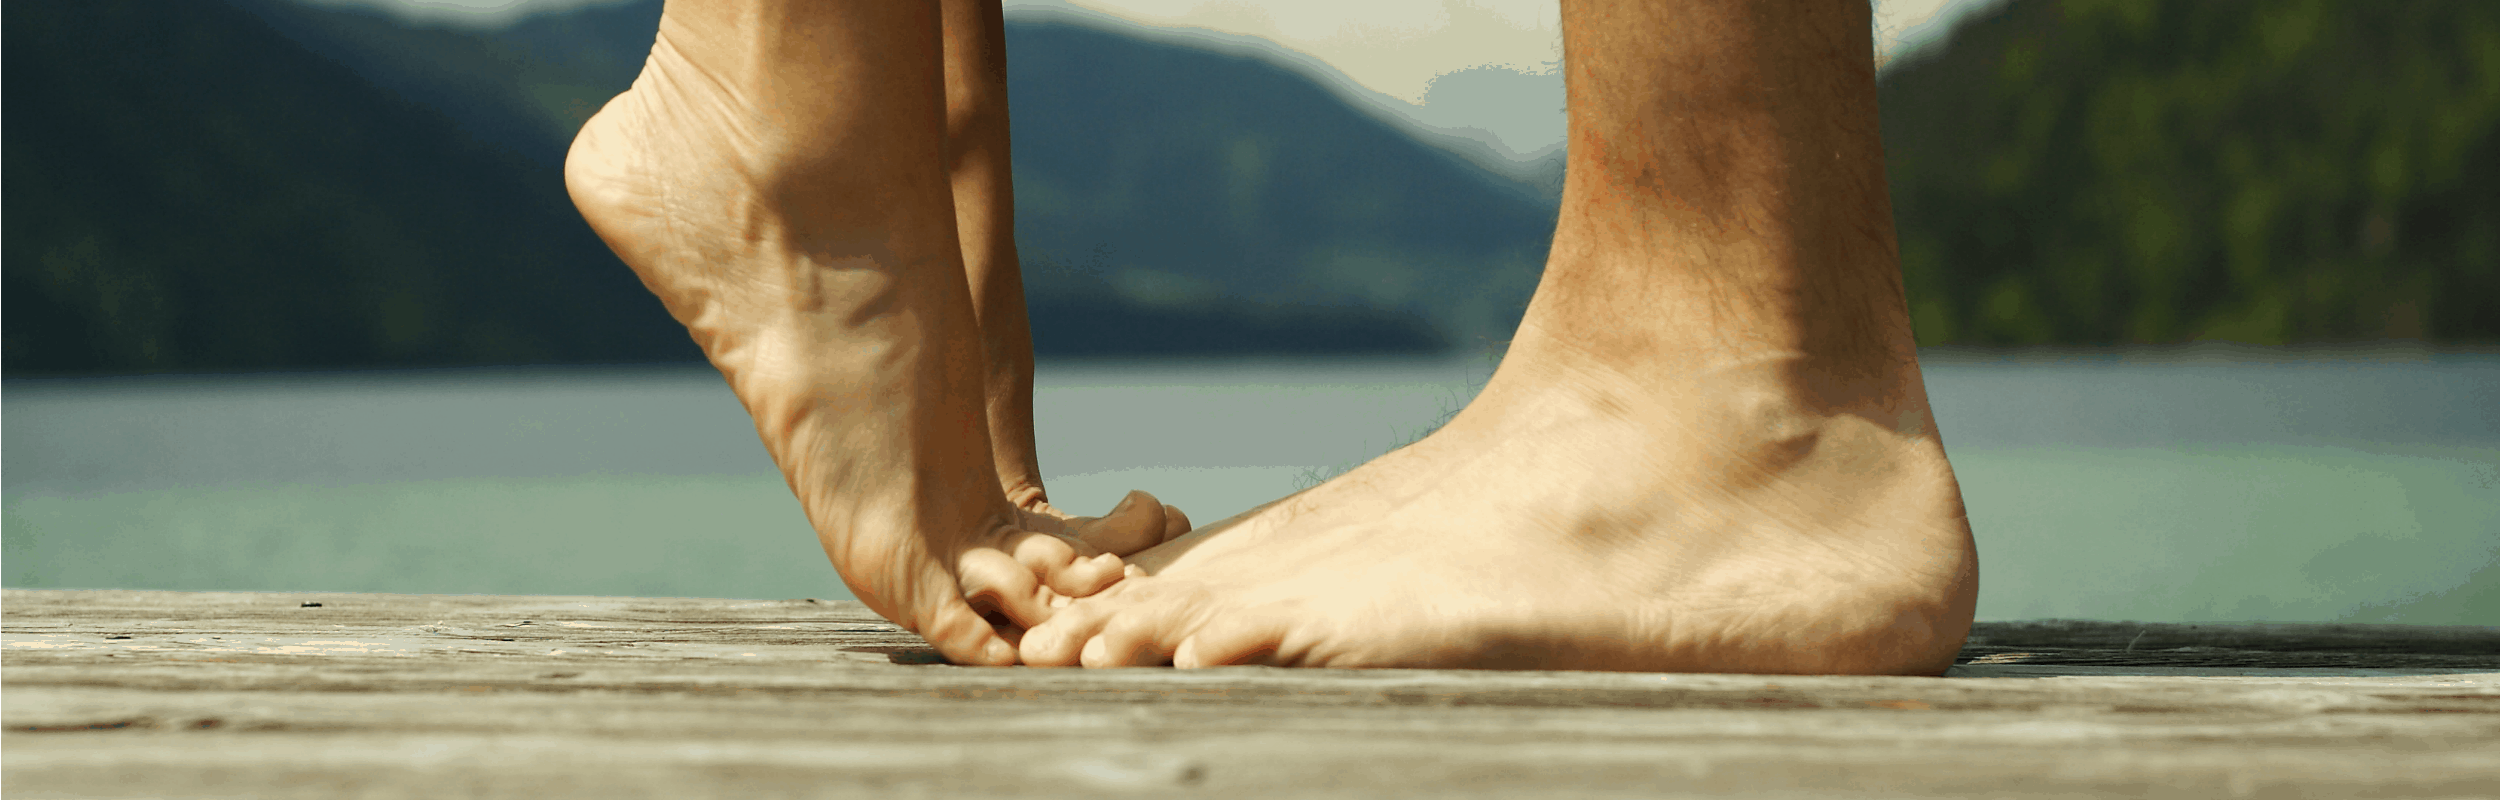 5 Ways to Enjoy a Romantic Staycation